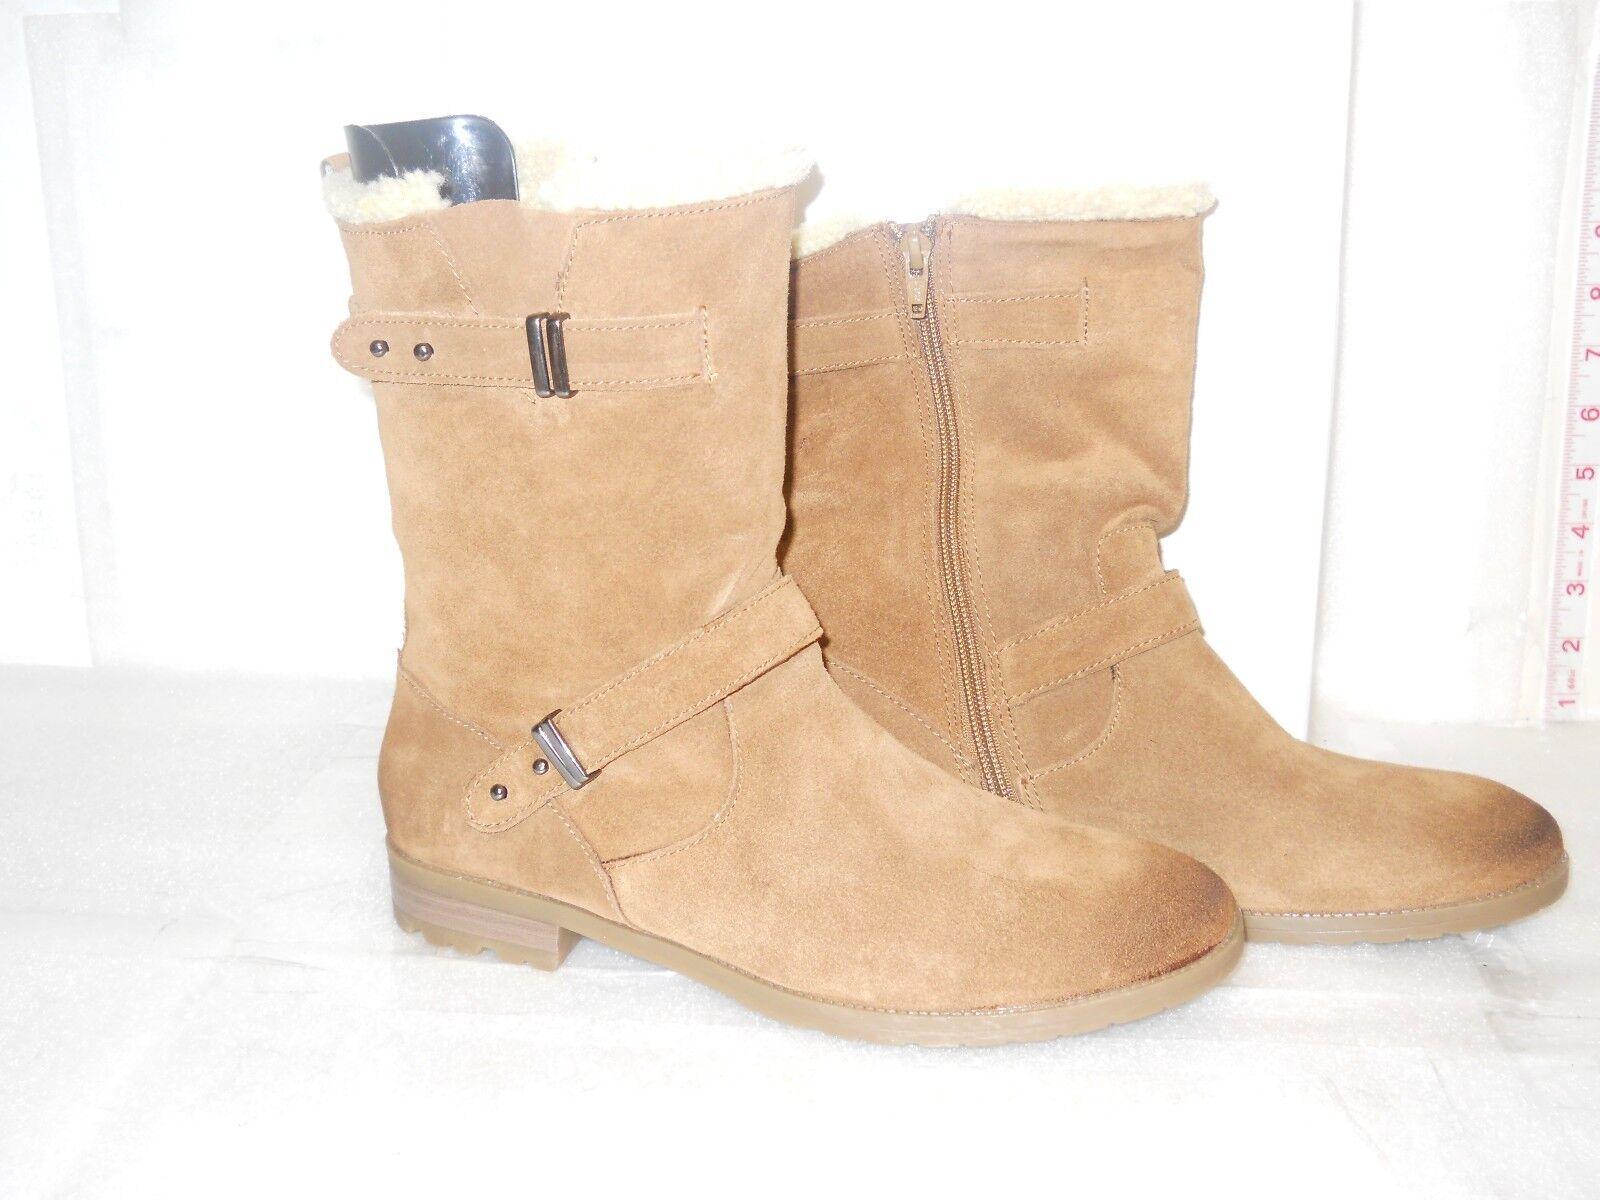 Alfani NEU Damenschuhe Sascha Braun Twig Suede Leder Stiefel 9 M Schuhes NWB